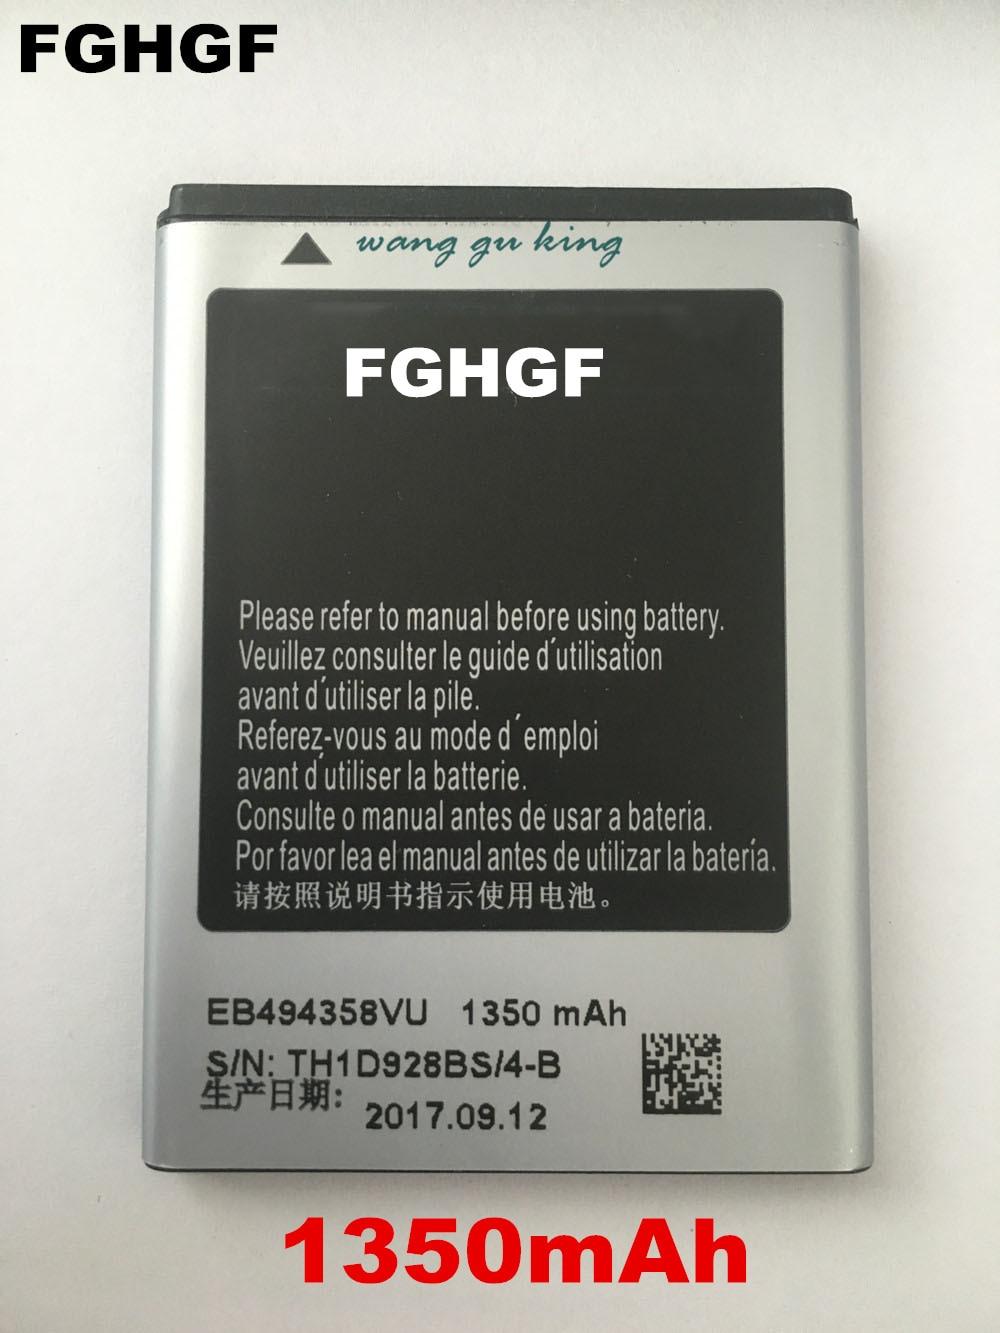 Fghgf Оригинальный Новый Батарея для Samsung Galaxy Ace S5830 <font><b>S5660</b></font> S5670 EB494358VU Ёмкость 1350 мАч